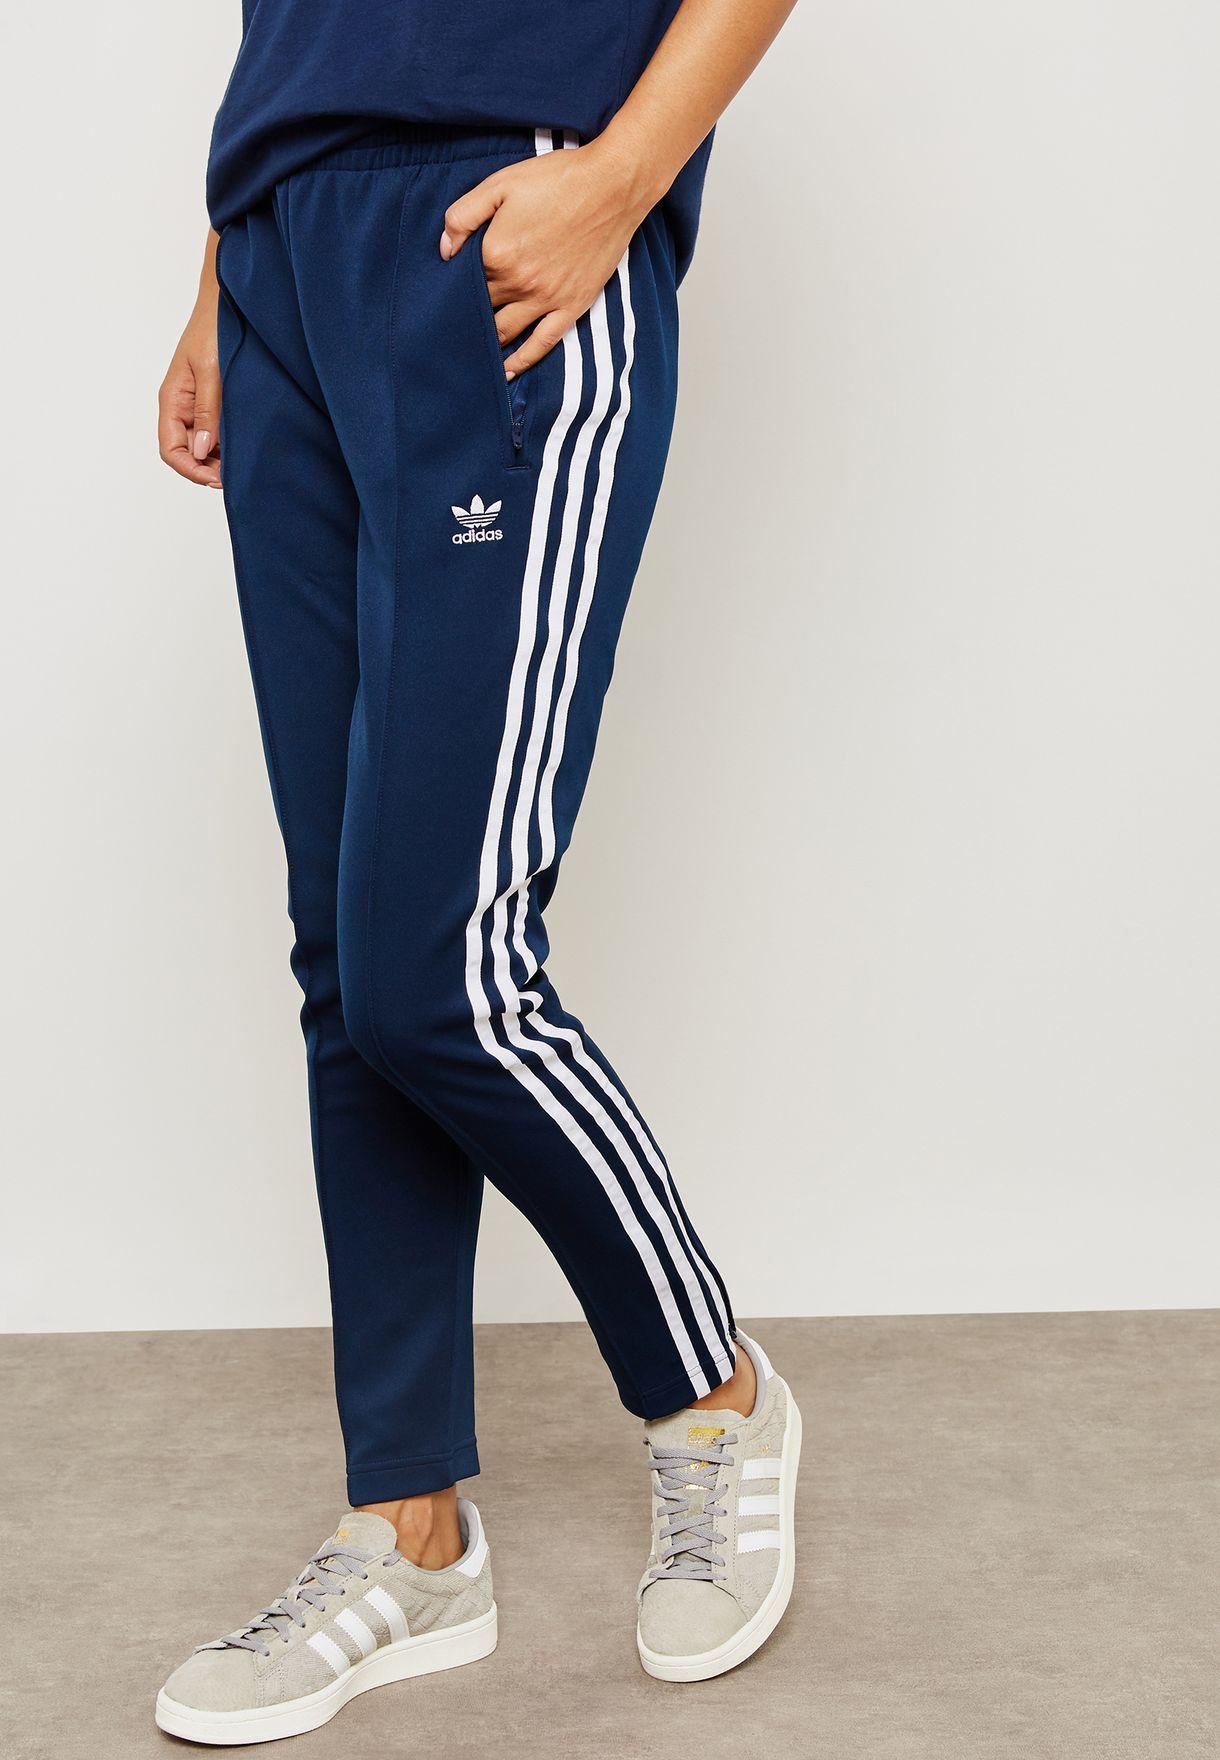 b01abeb7c58 Shop adidas Originals navy adicolor Superstar Sweatpants DH3159 for Women  in Oman - AD478AT17YHE